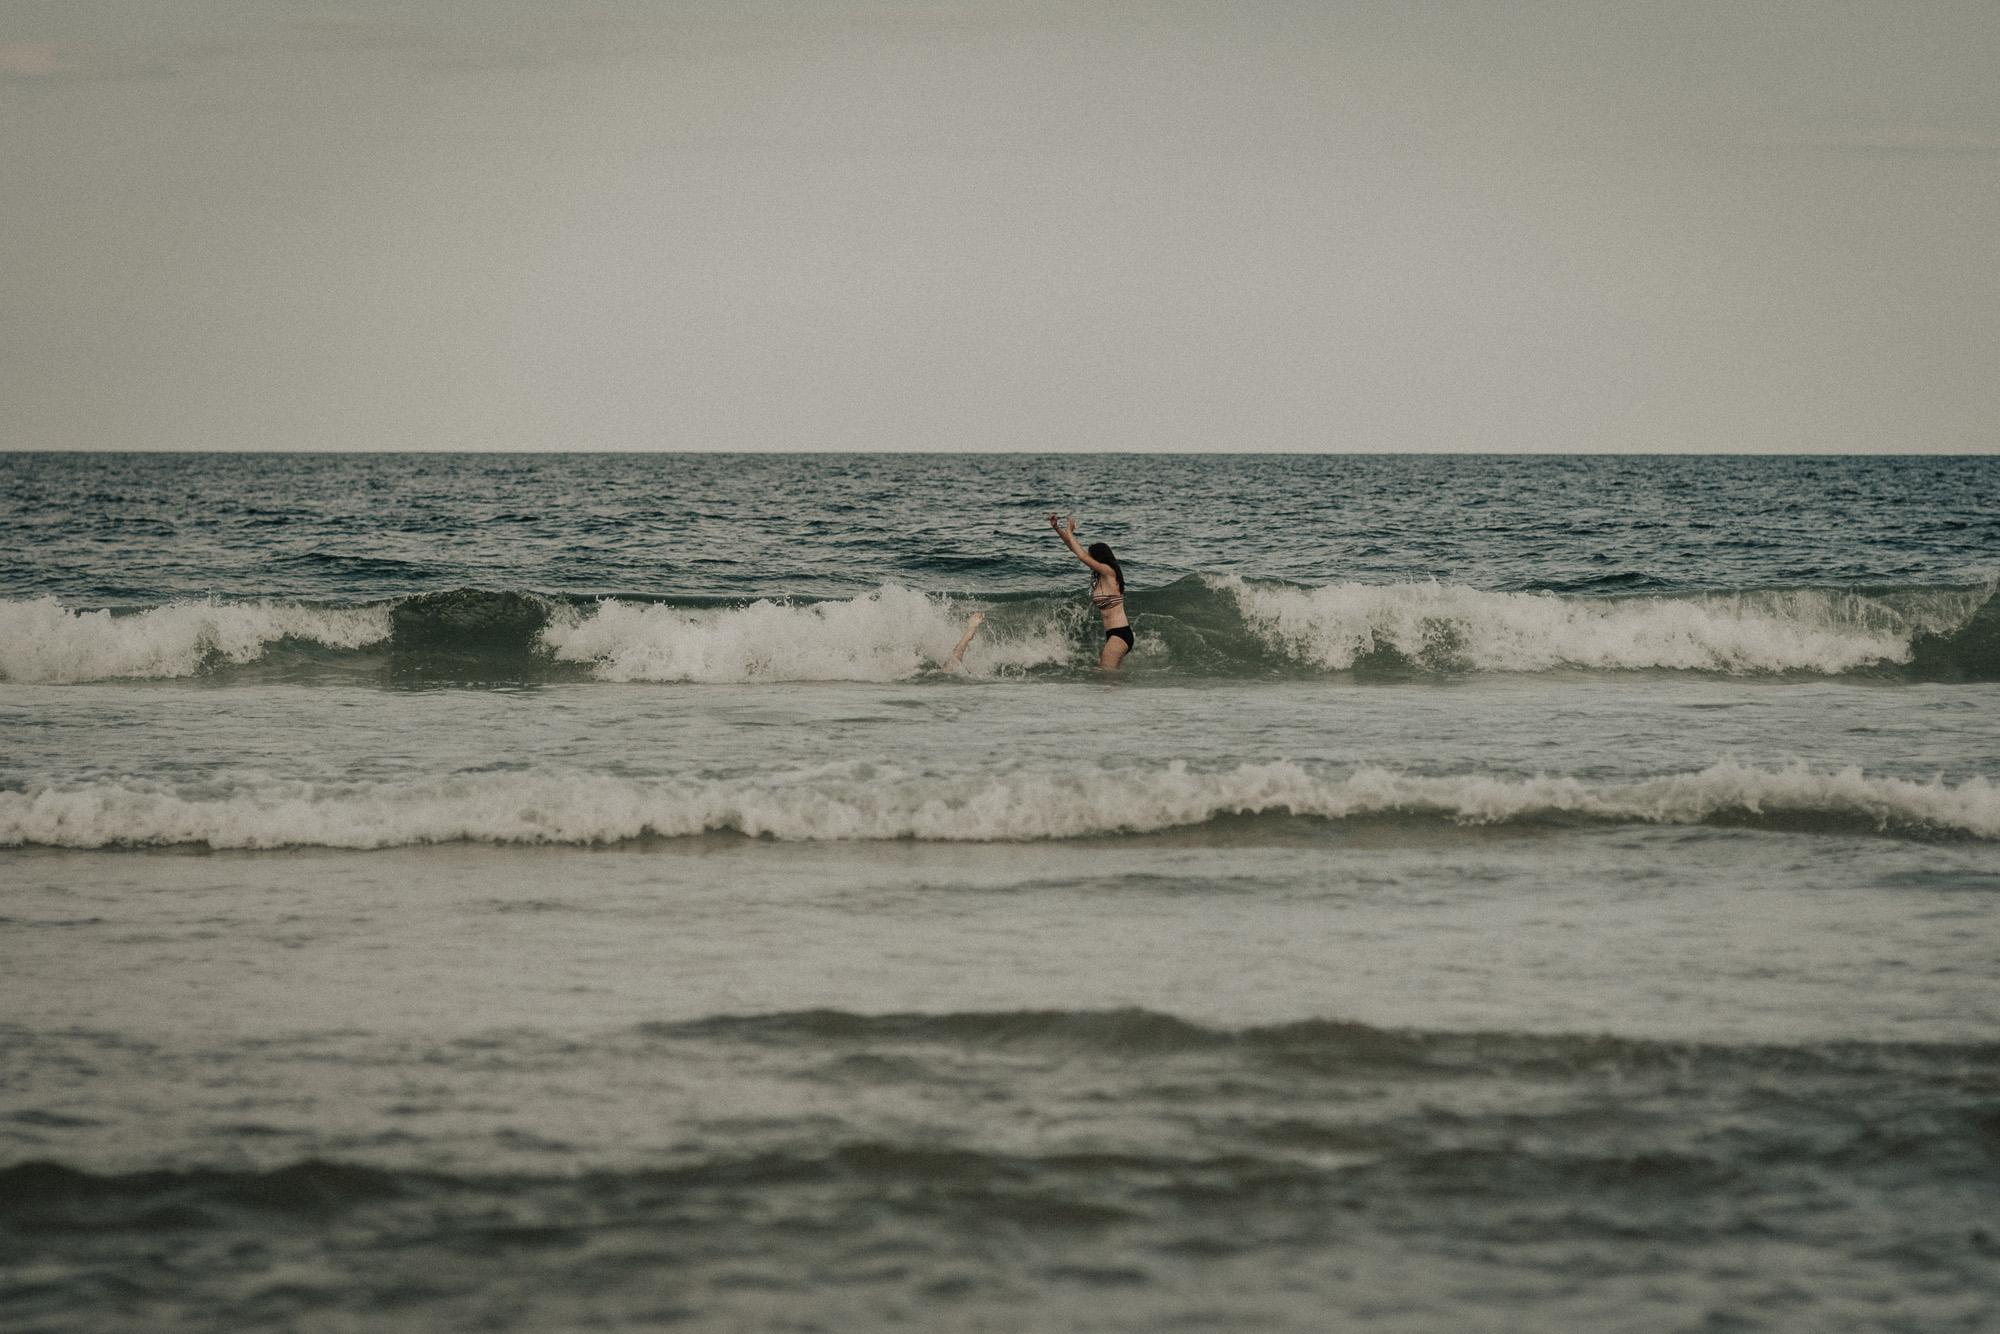 Island Beach State Park engagement photos - KyleWillisPhoto